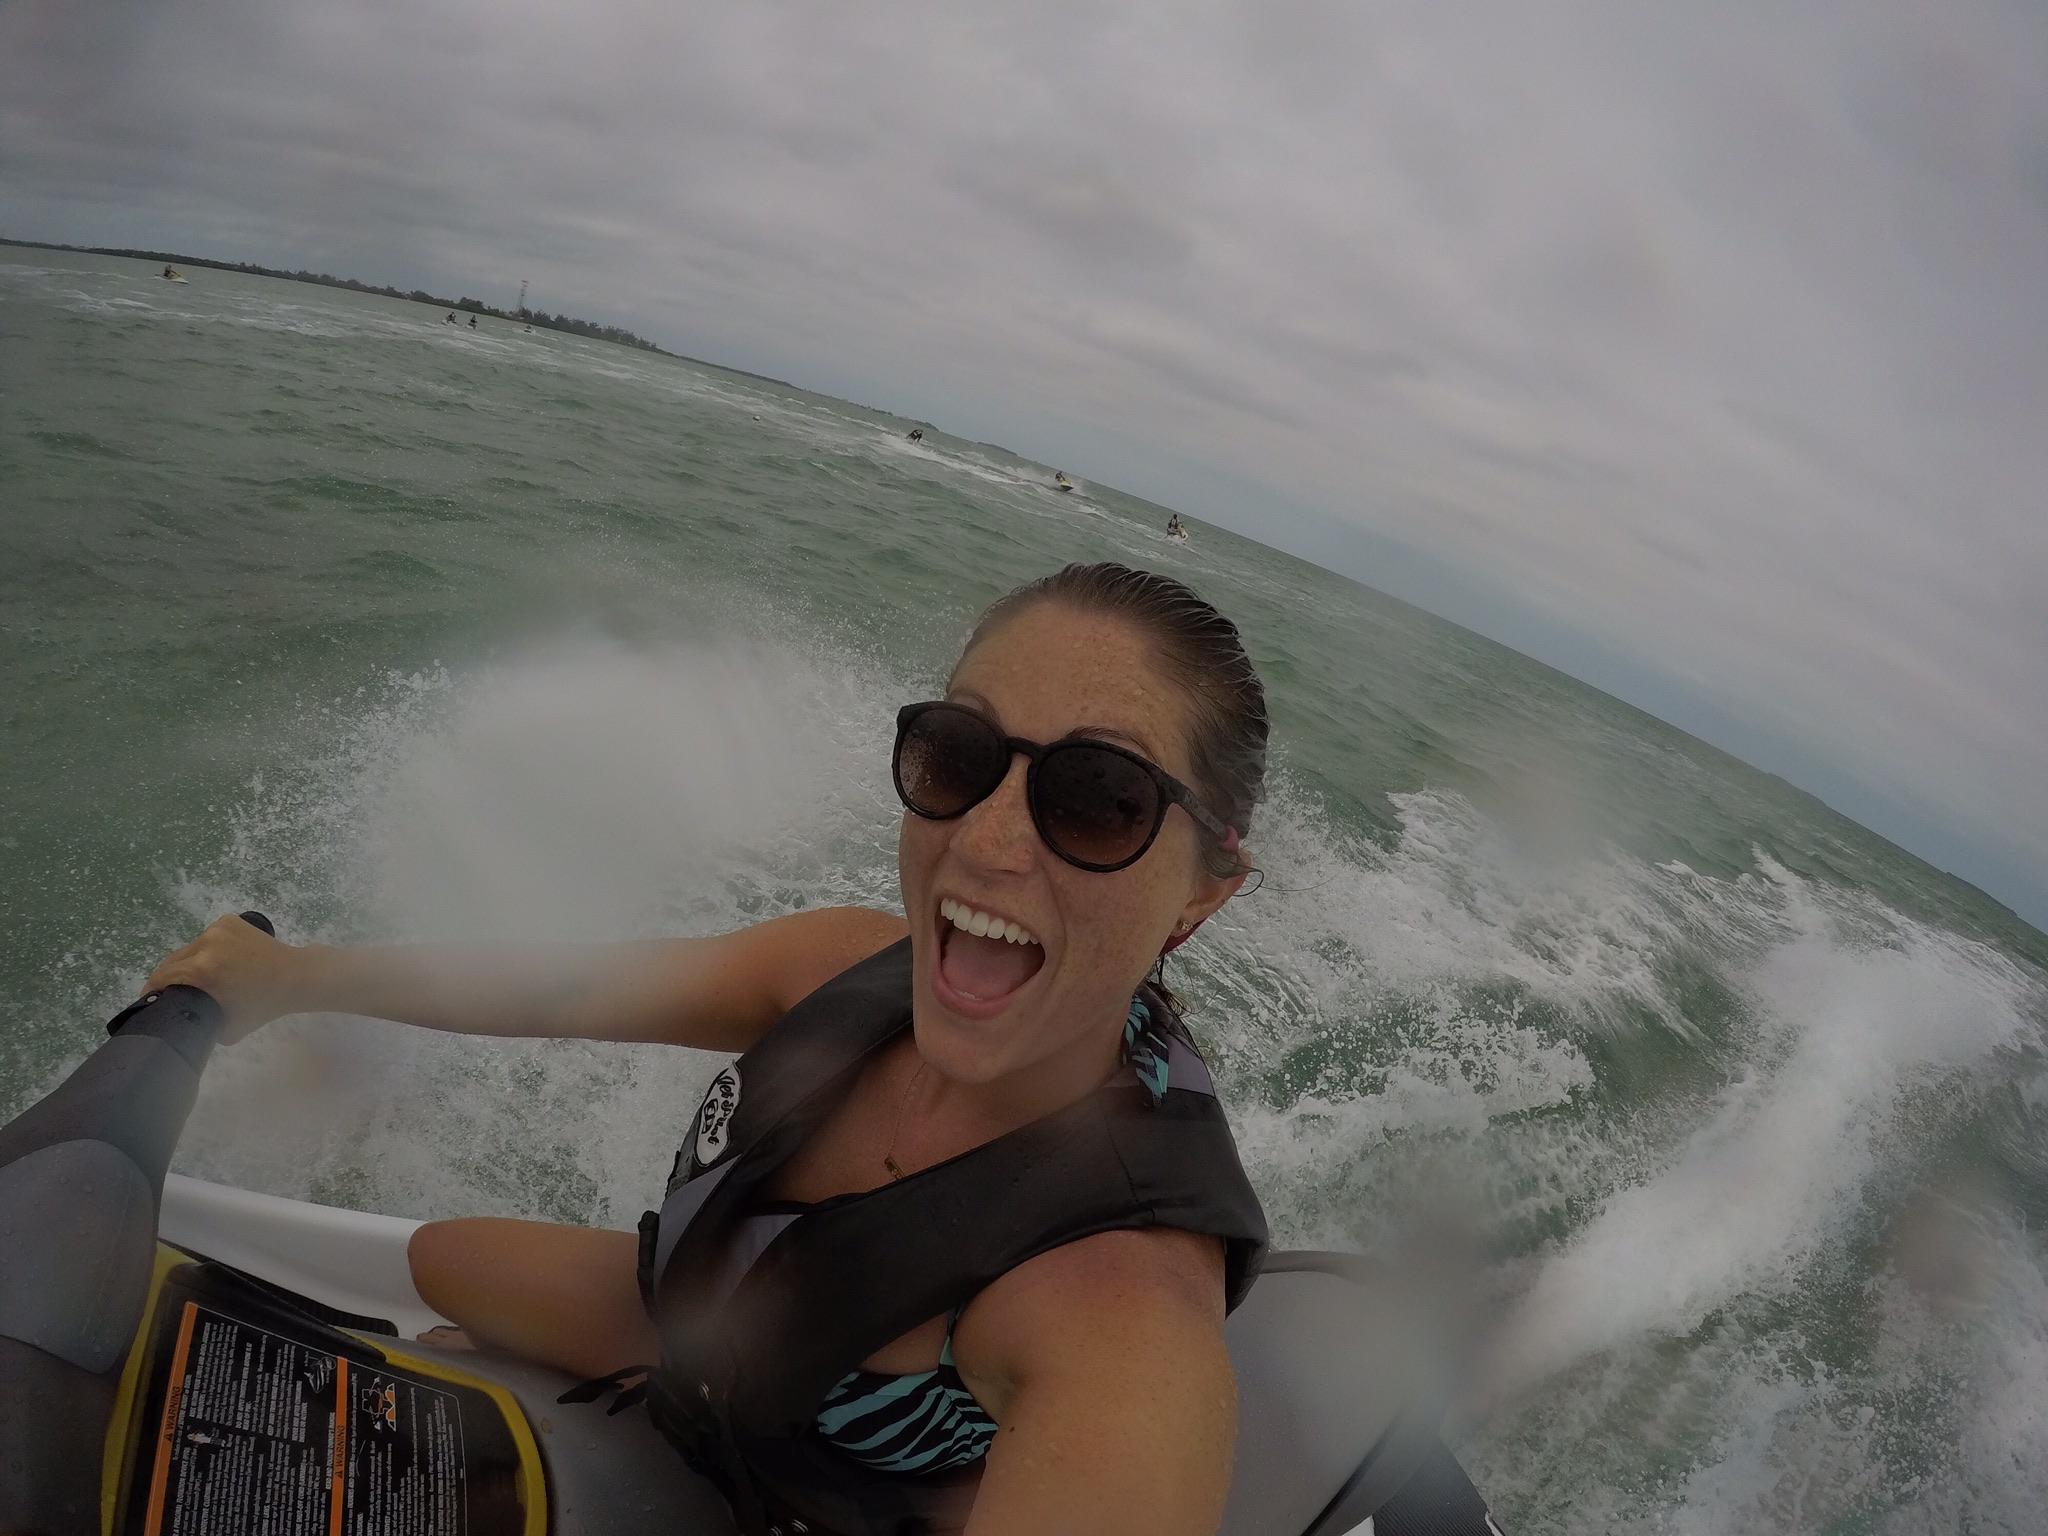 You Gain Confidence + Independence - Megan Roberts, @mega_RN